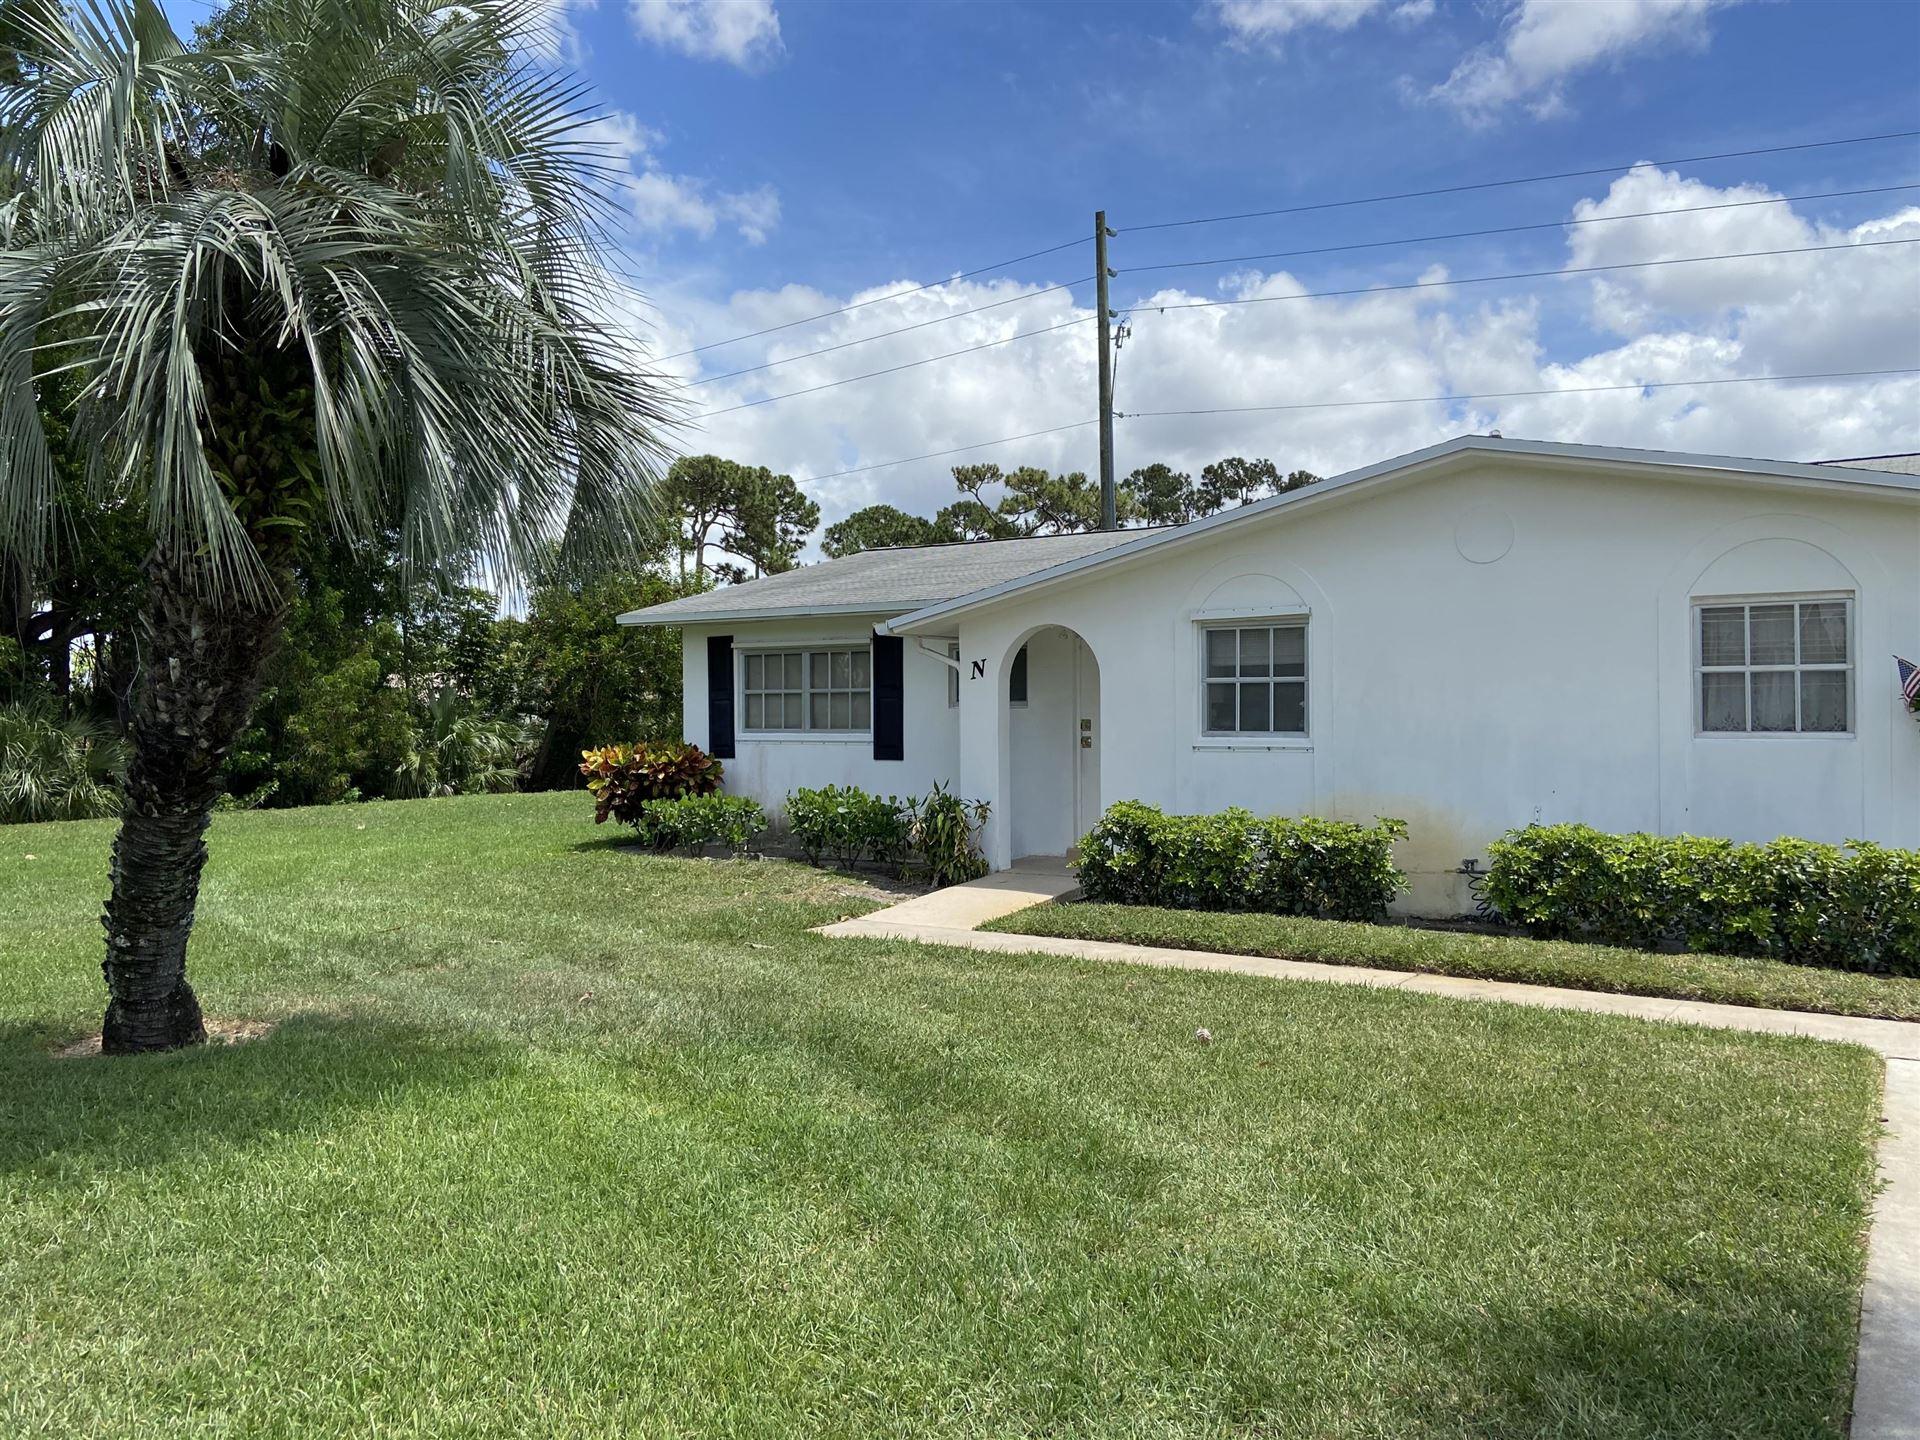 2916 Crosley Drive E #N, West Palm Beach, FL 33415 - MLS#: RX-10720662